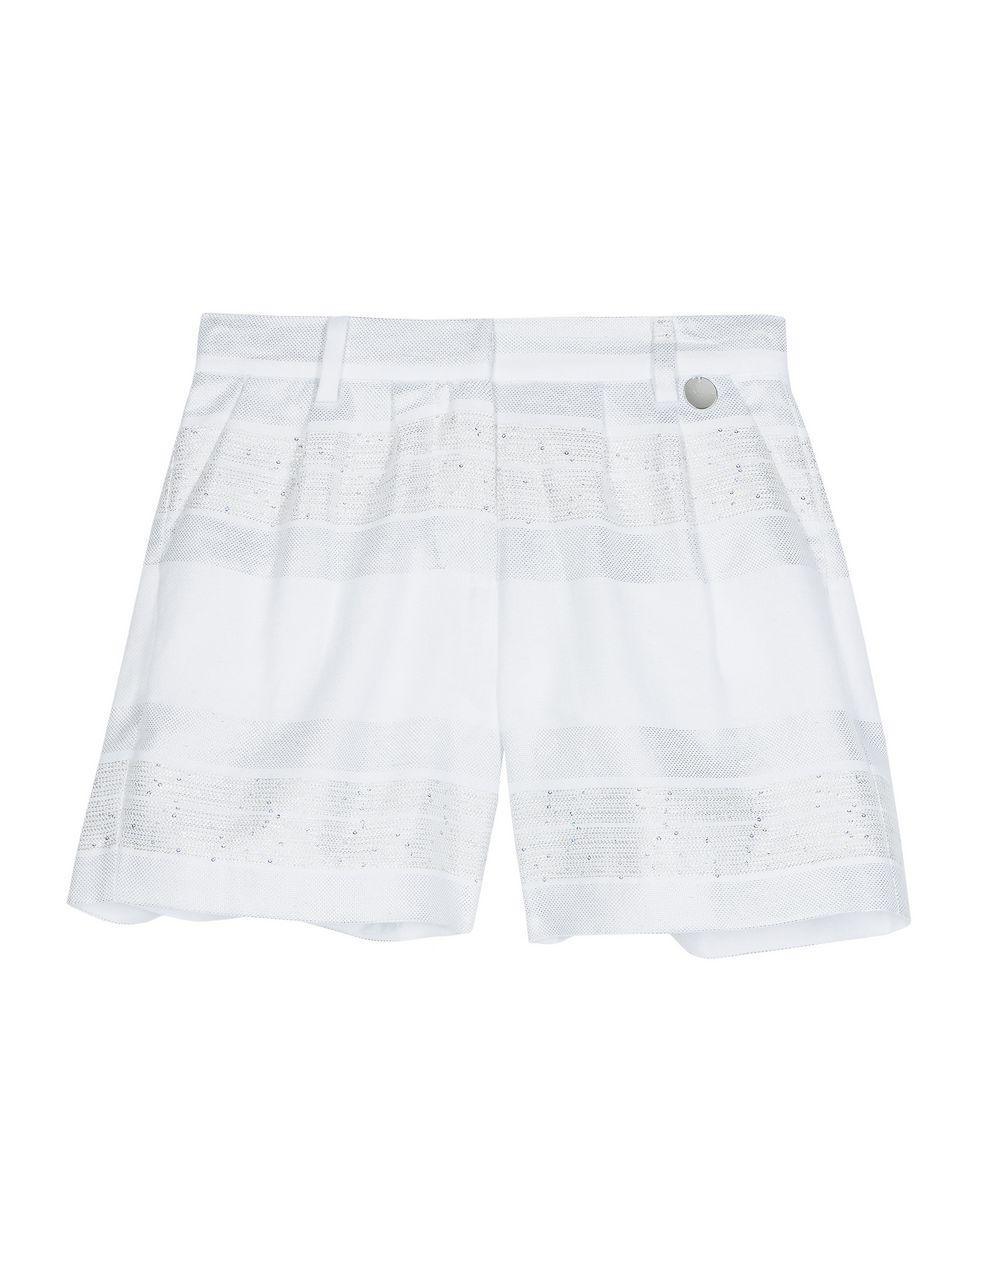 WHITE AND SILVER BERMUDA SHORTS   - Lanvin